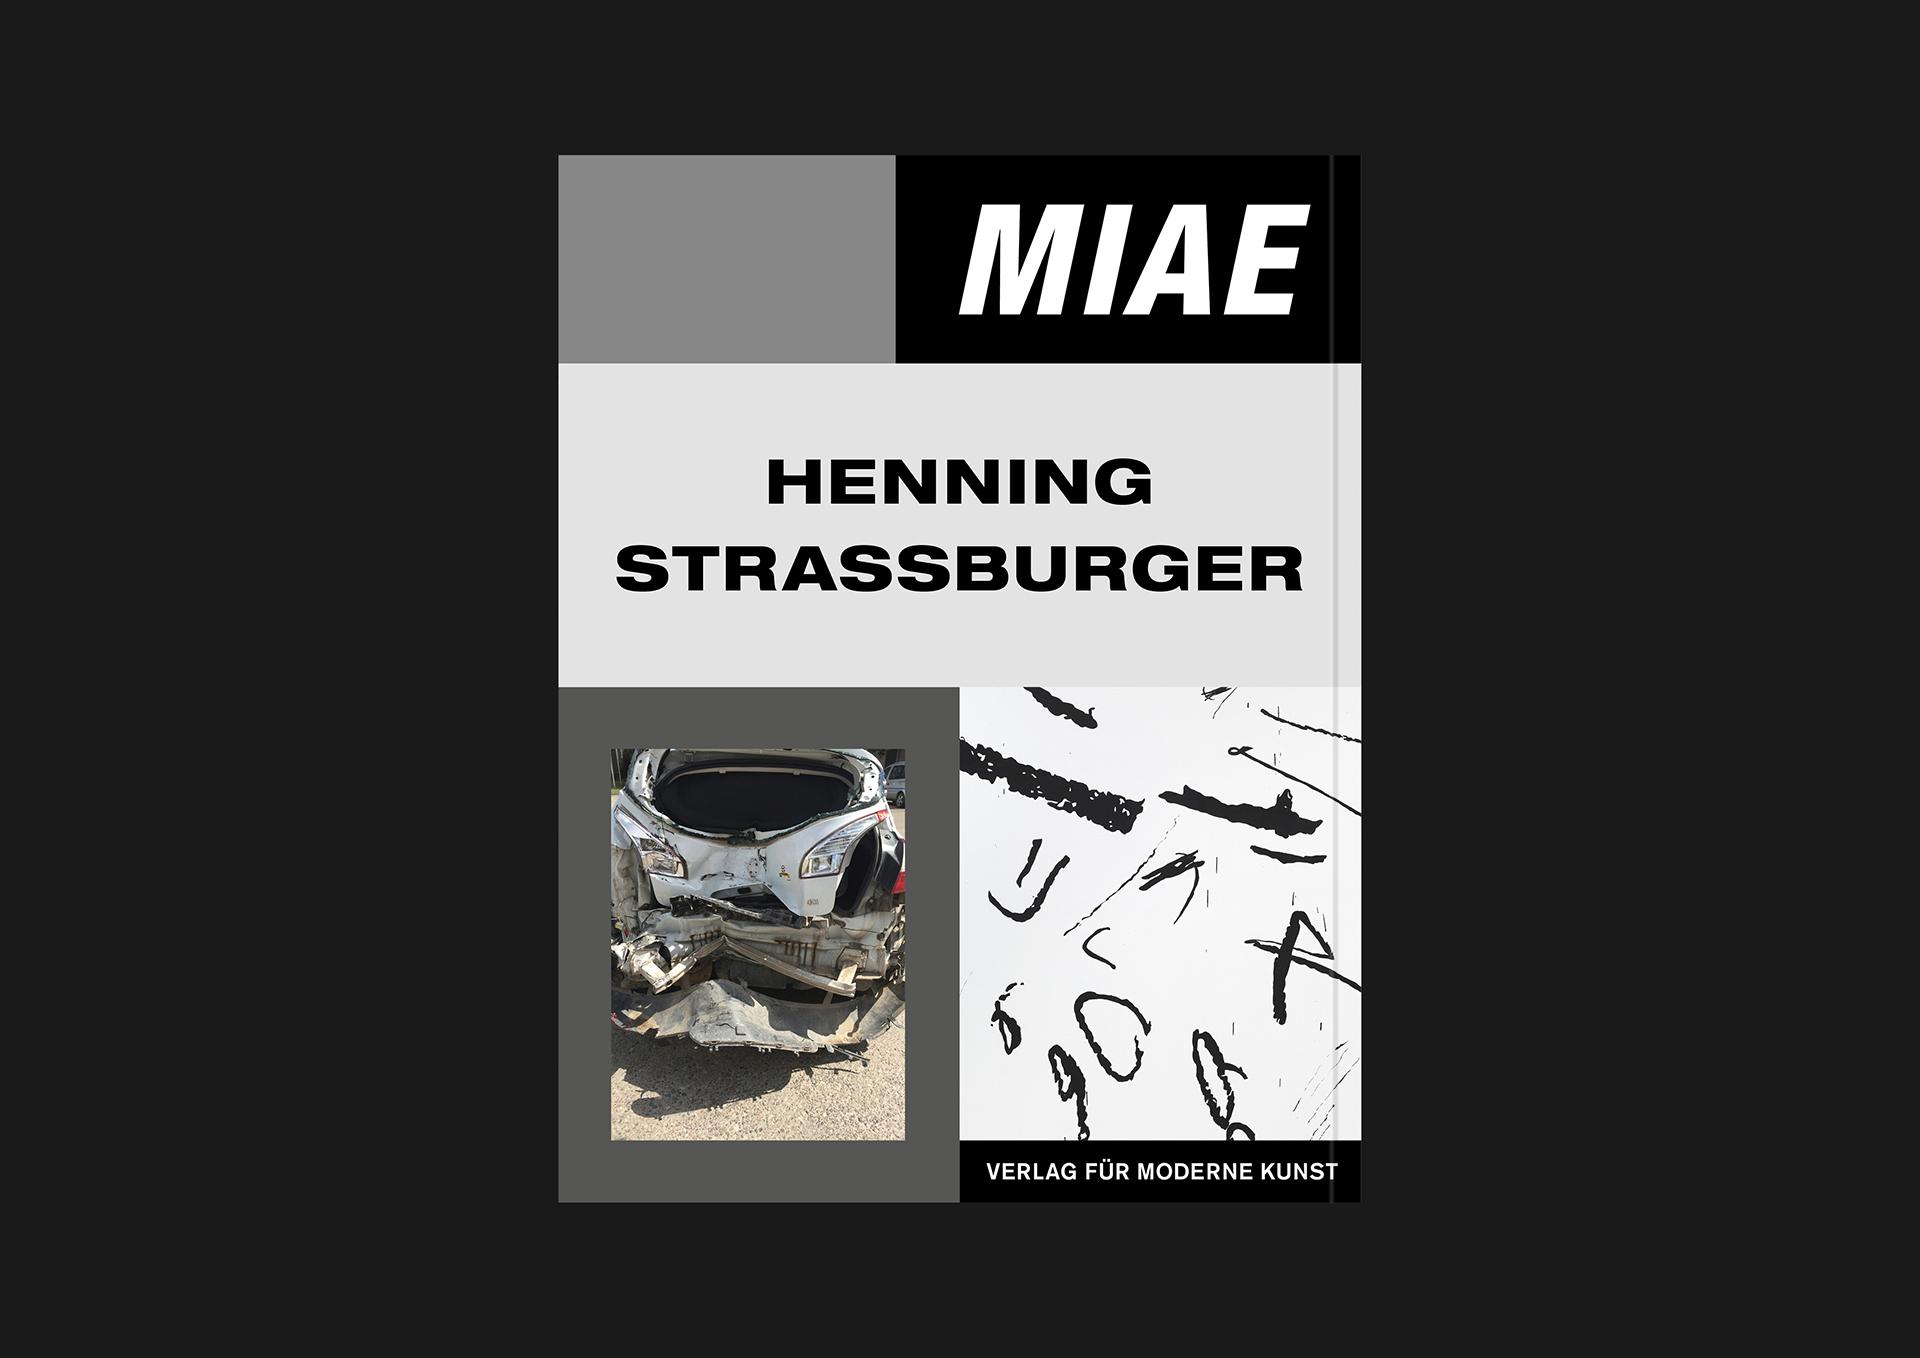 SMS_HS_MIAE_24